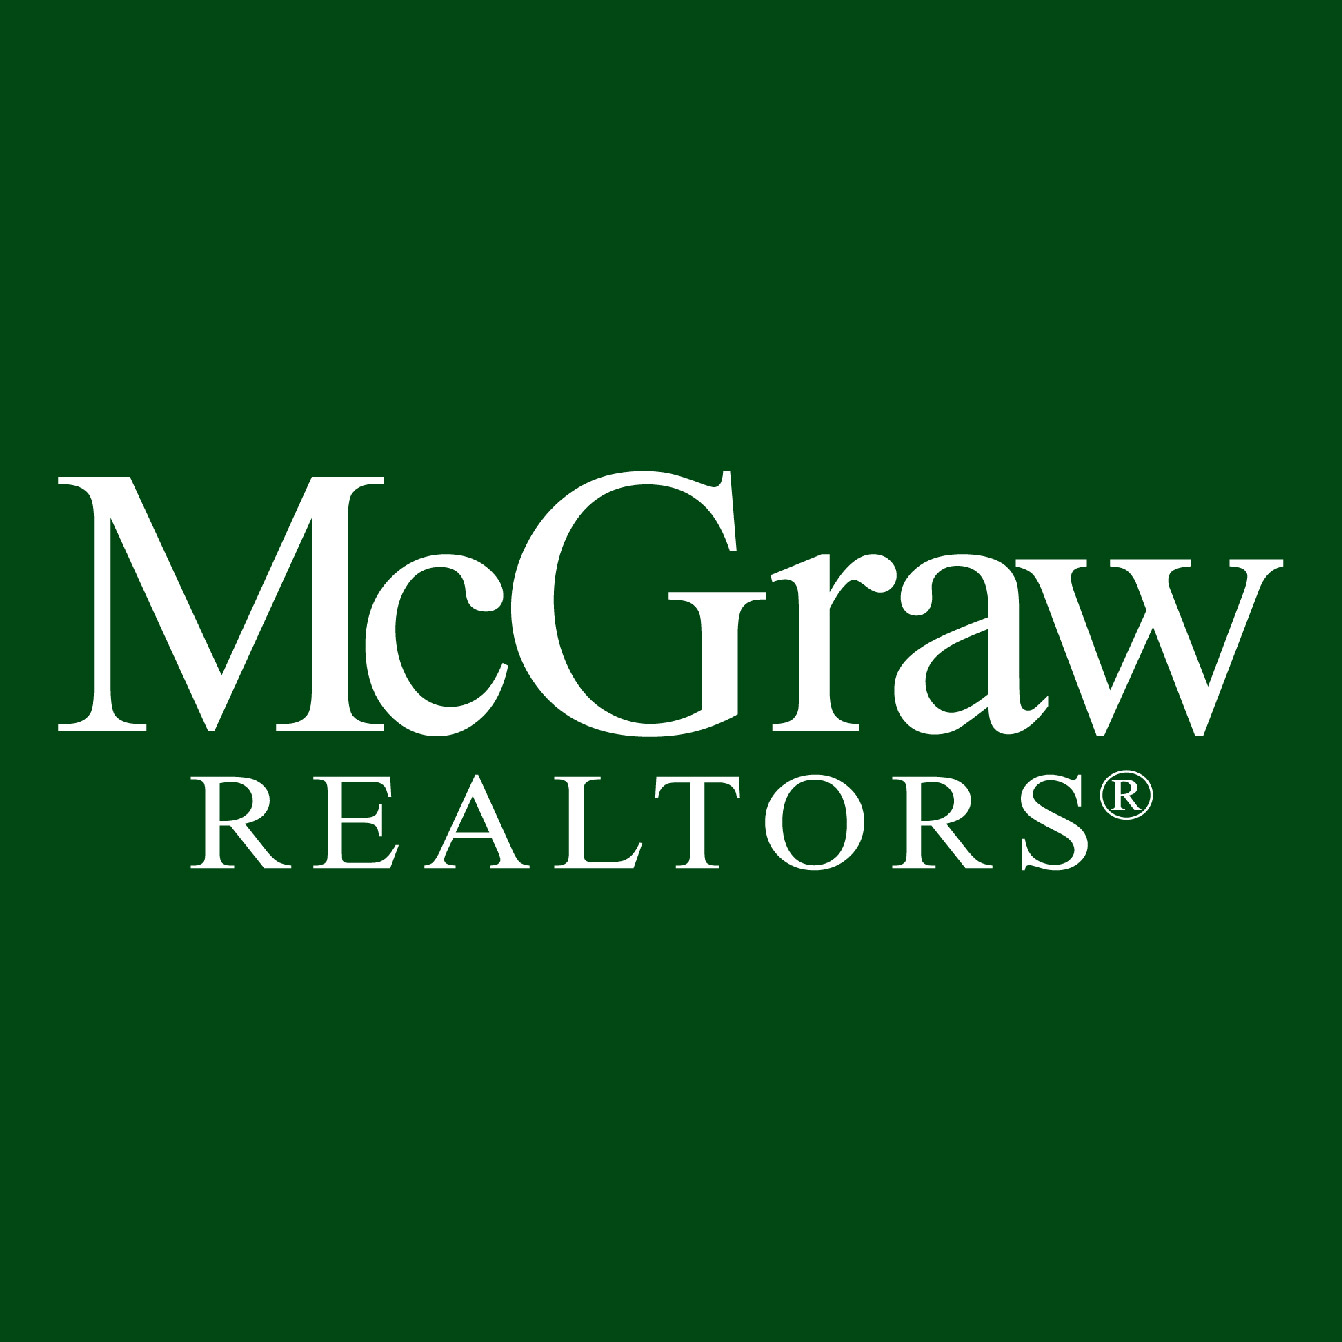 McGraw Realtors - 71st St